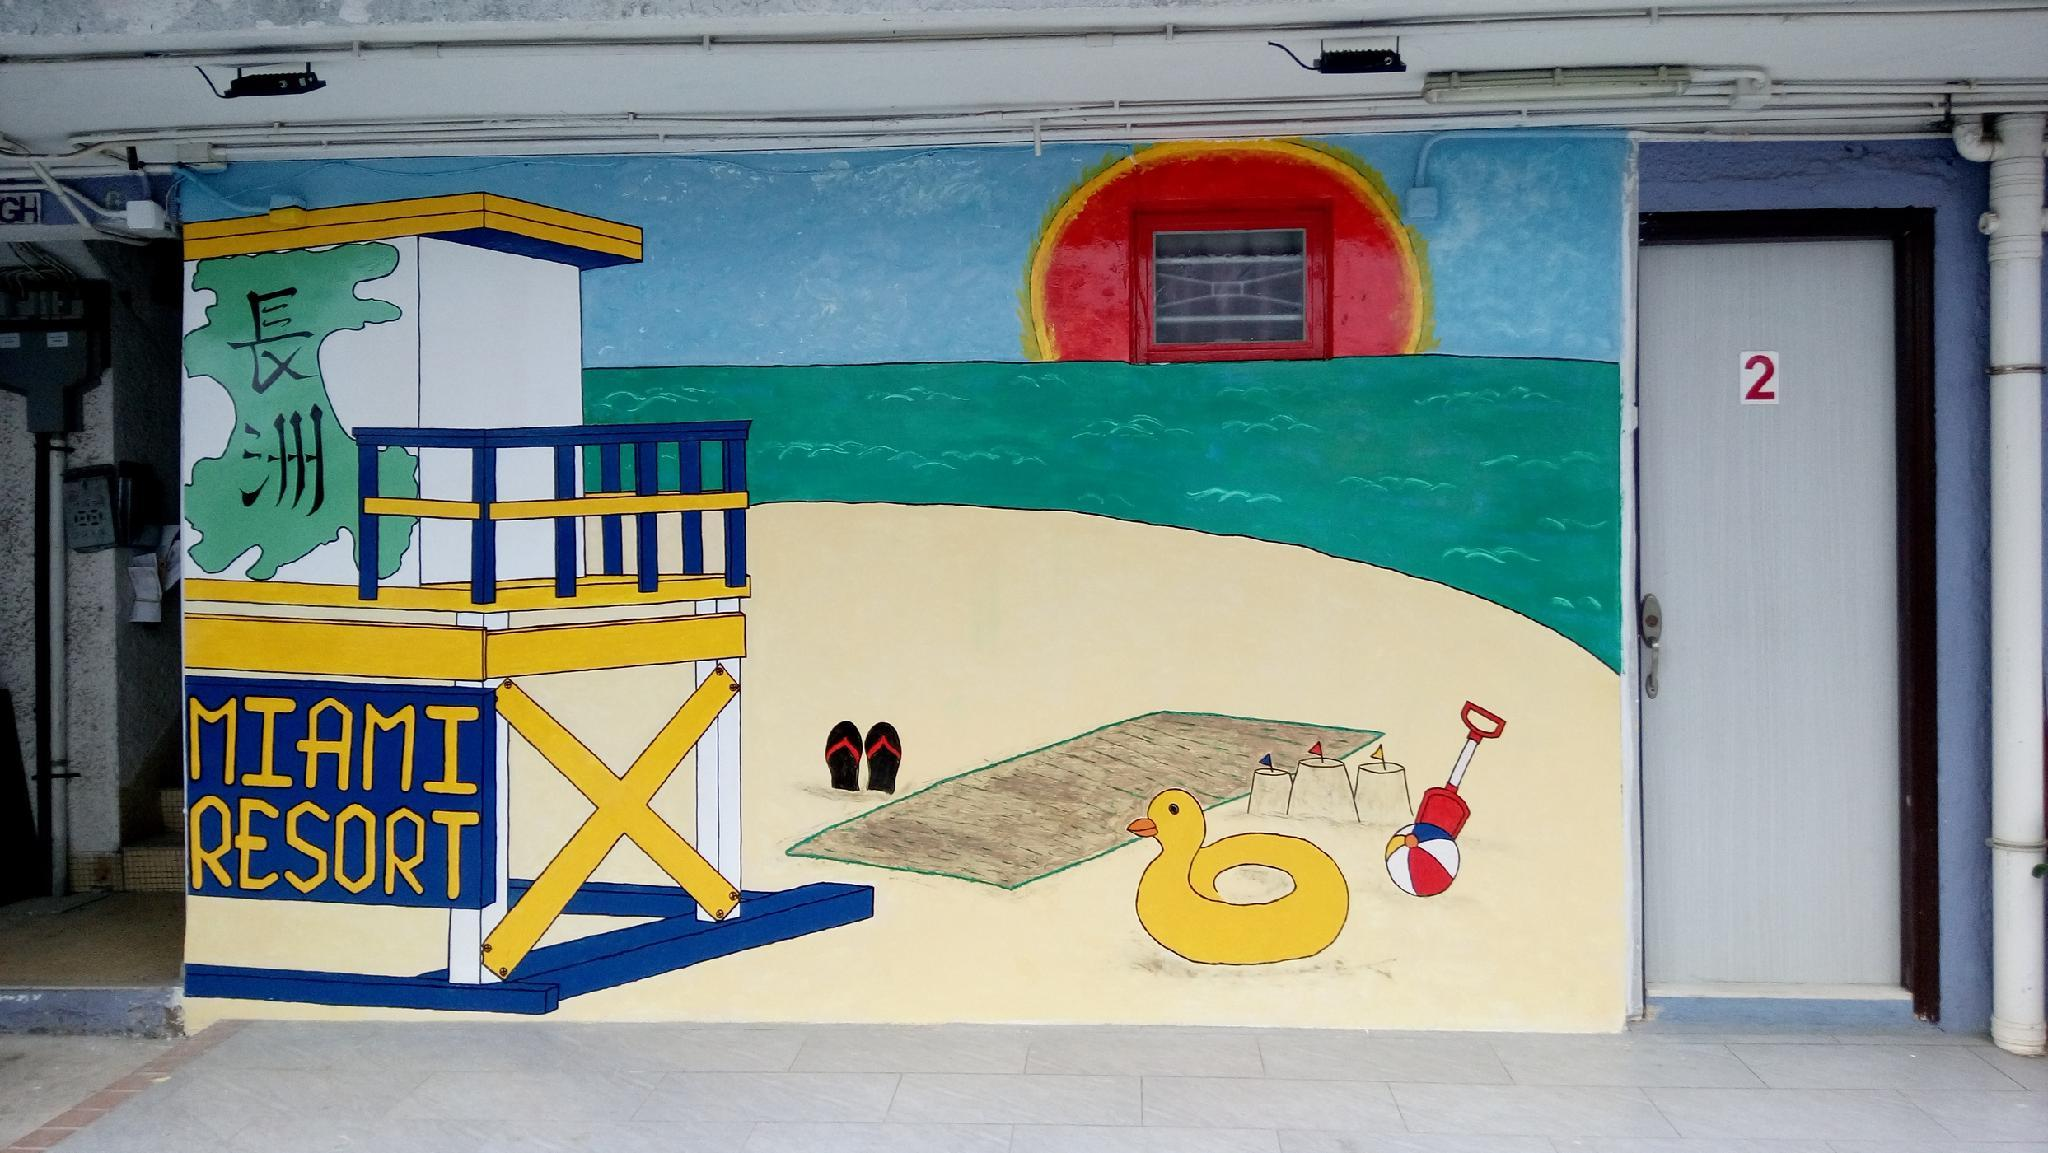 Miami Resort, Lantau Islands